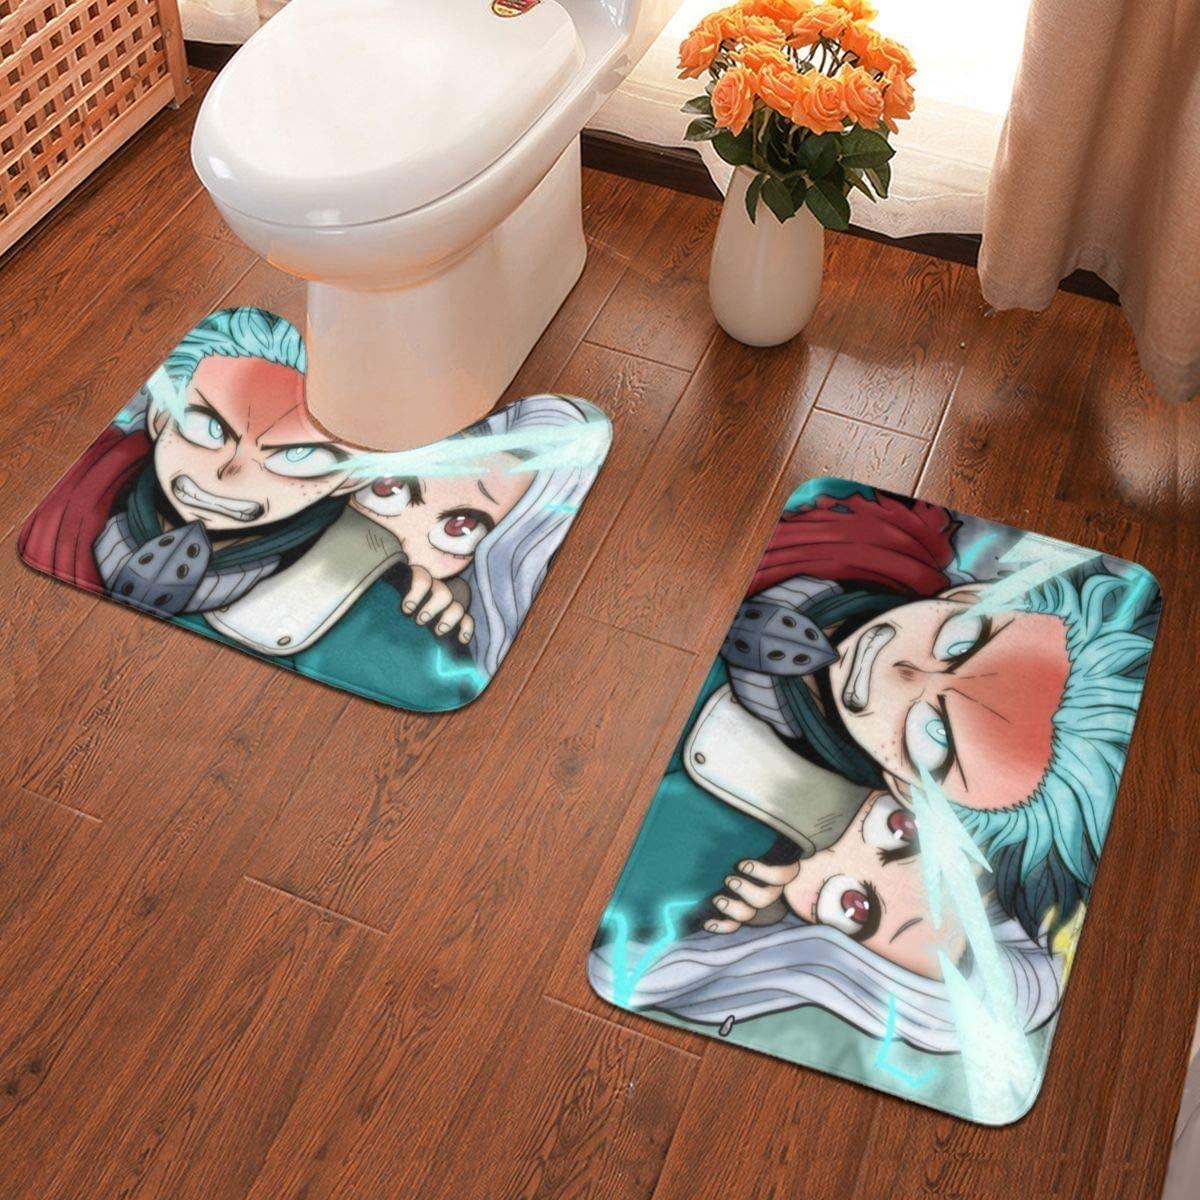 Boweike My Hero Academia Bathroom Antiskid Pad Non-Slip Bath Carpet Floor Mat Rug 2 Sets -Floor Mat+U-Shaped Pad, Toilet Washable Blanket Mats for Bathroom Home Shower